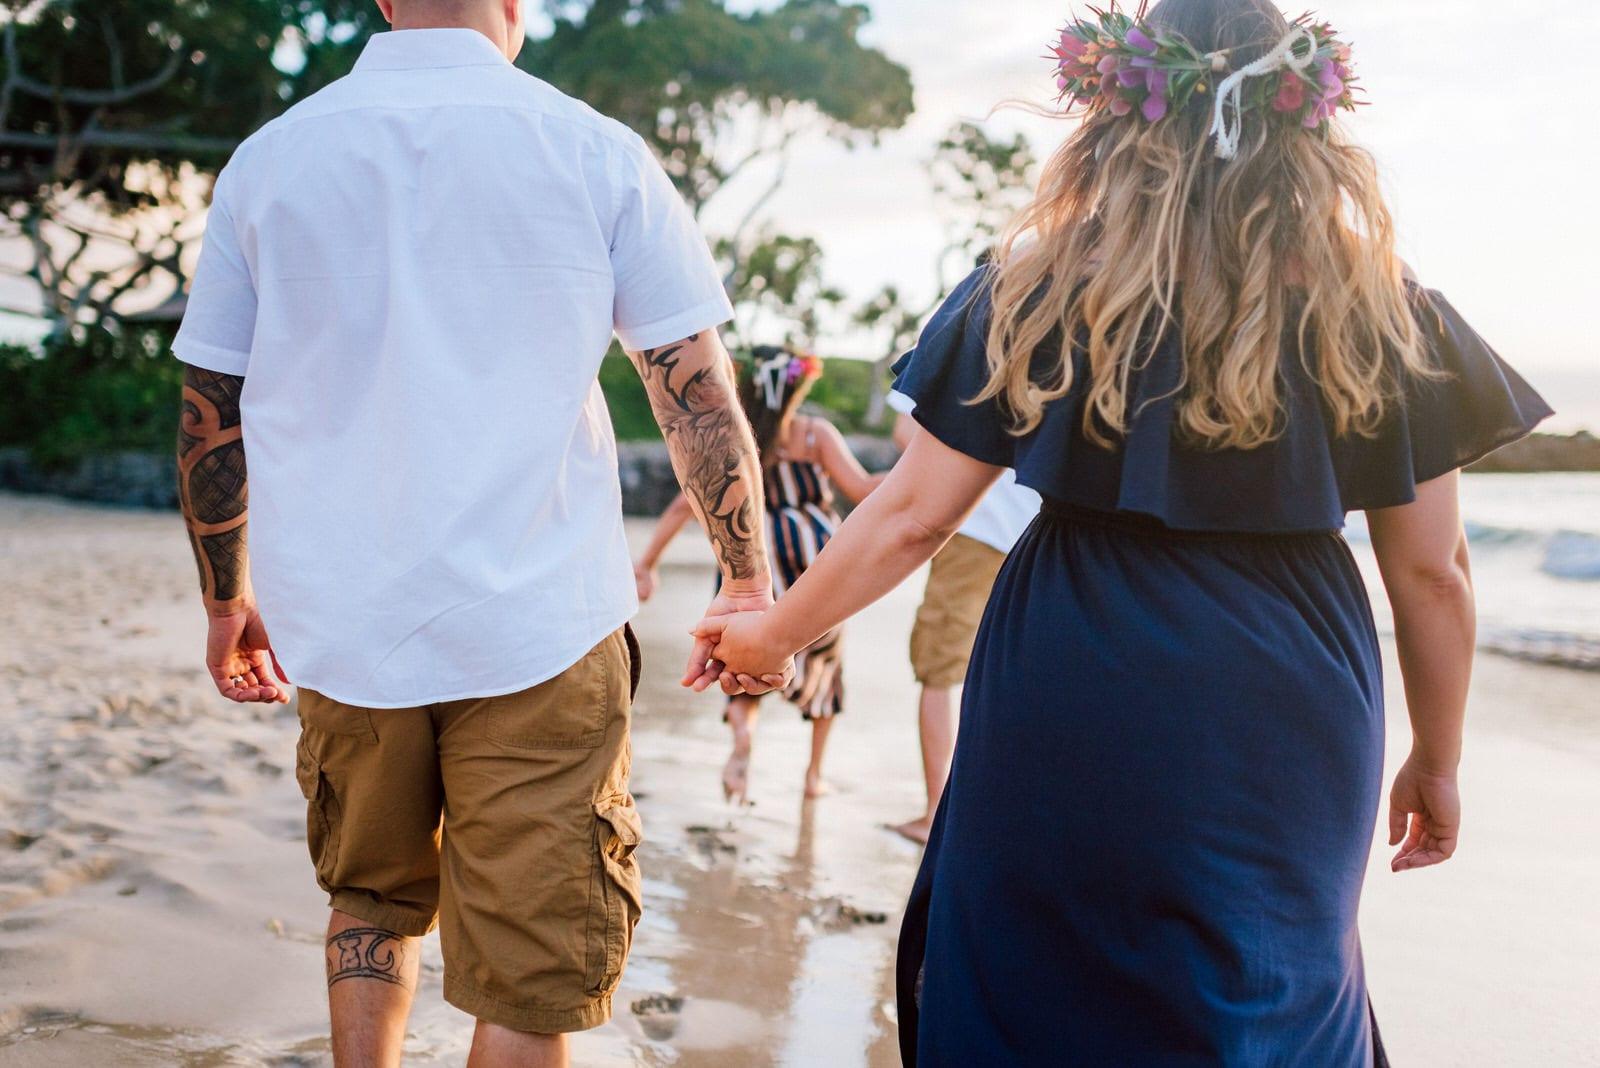 Family-Photographer-Mauna-Kea-Hotel-Large-Family-Colorful-Sunset-24.jpg